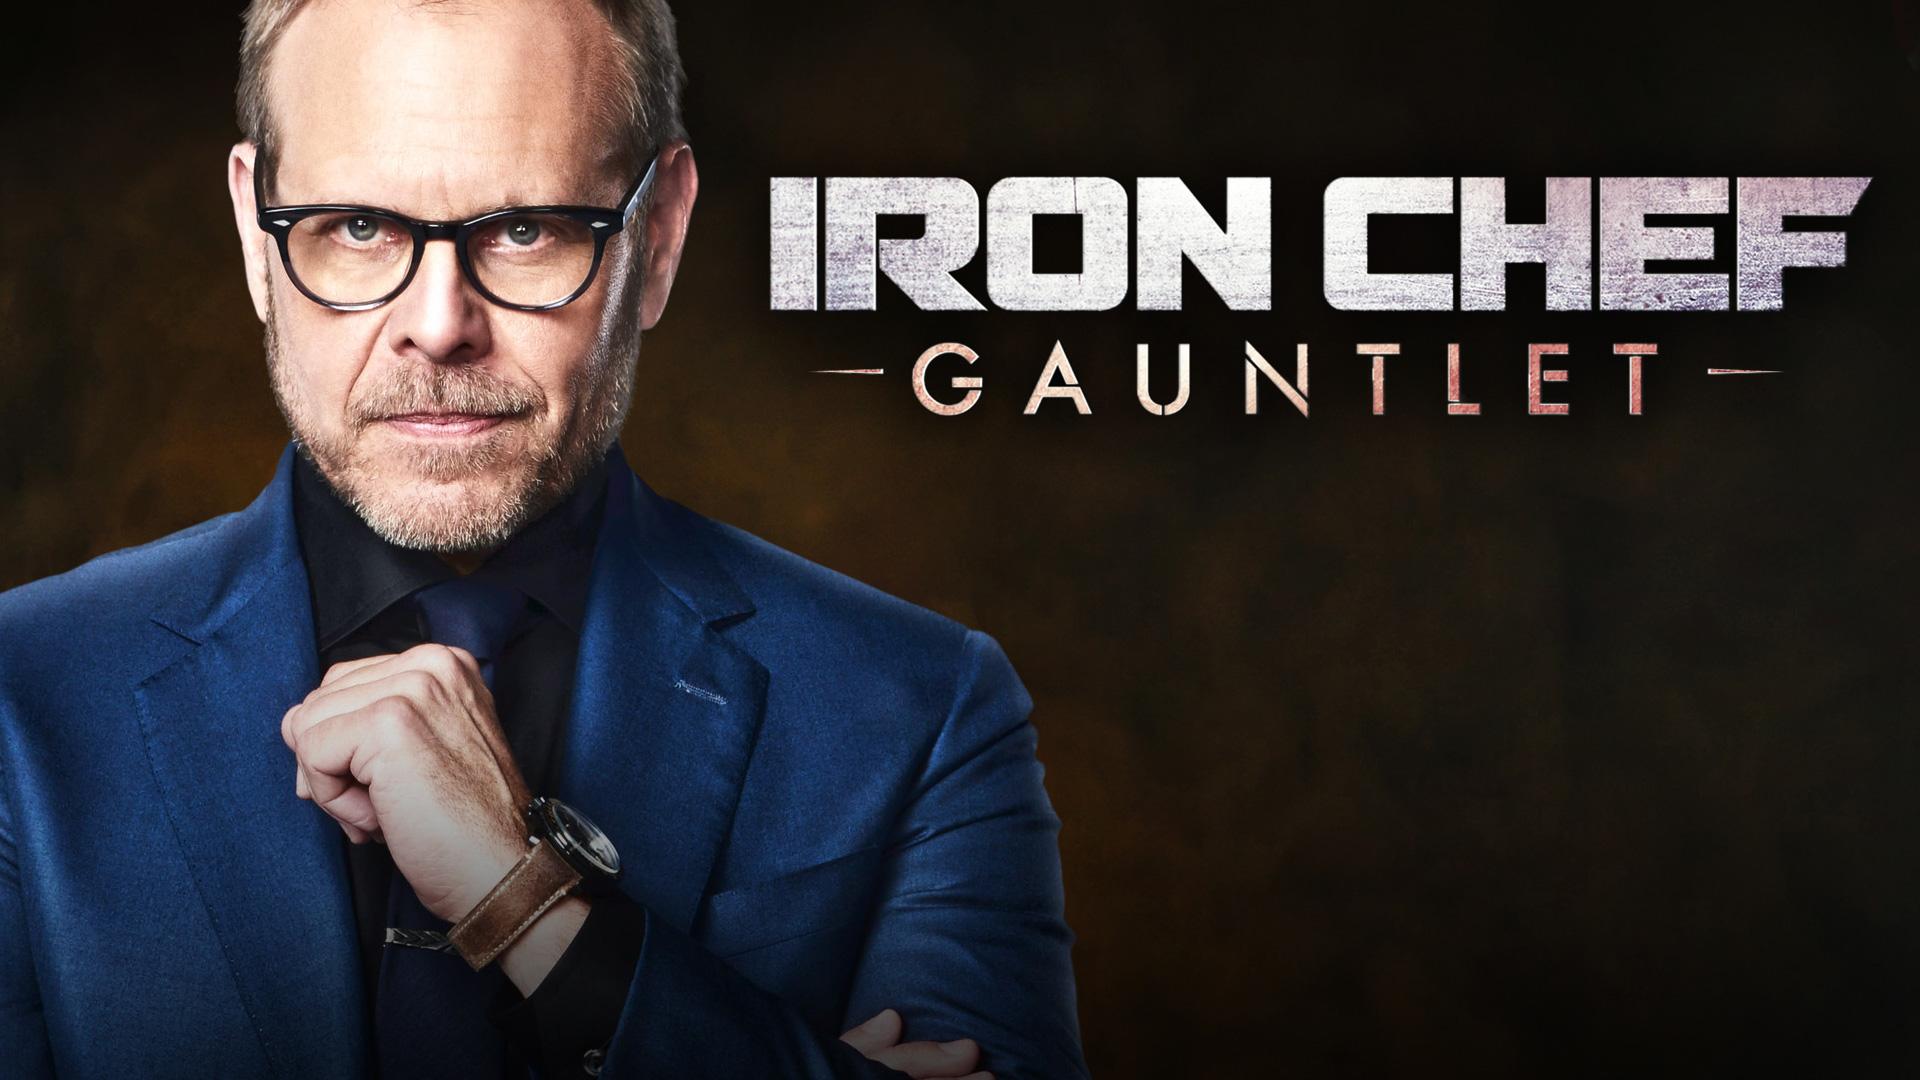 Iron Chef Gauntlet, Season 1